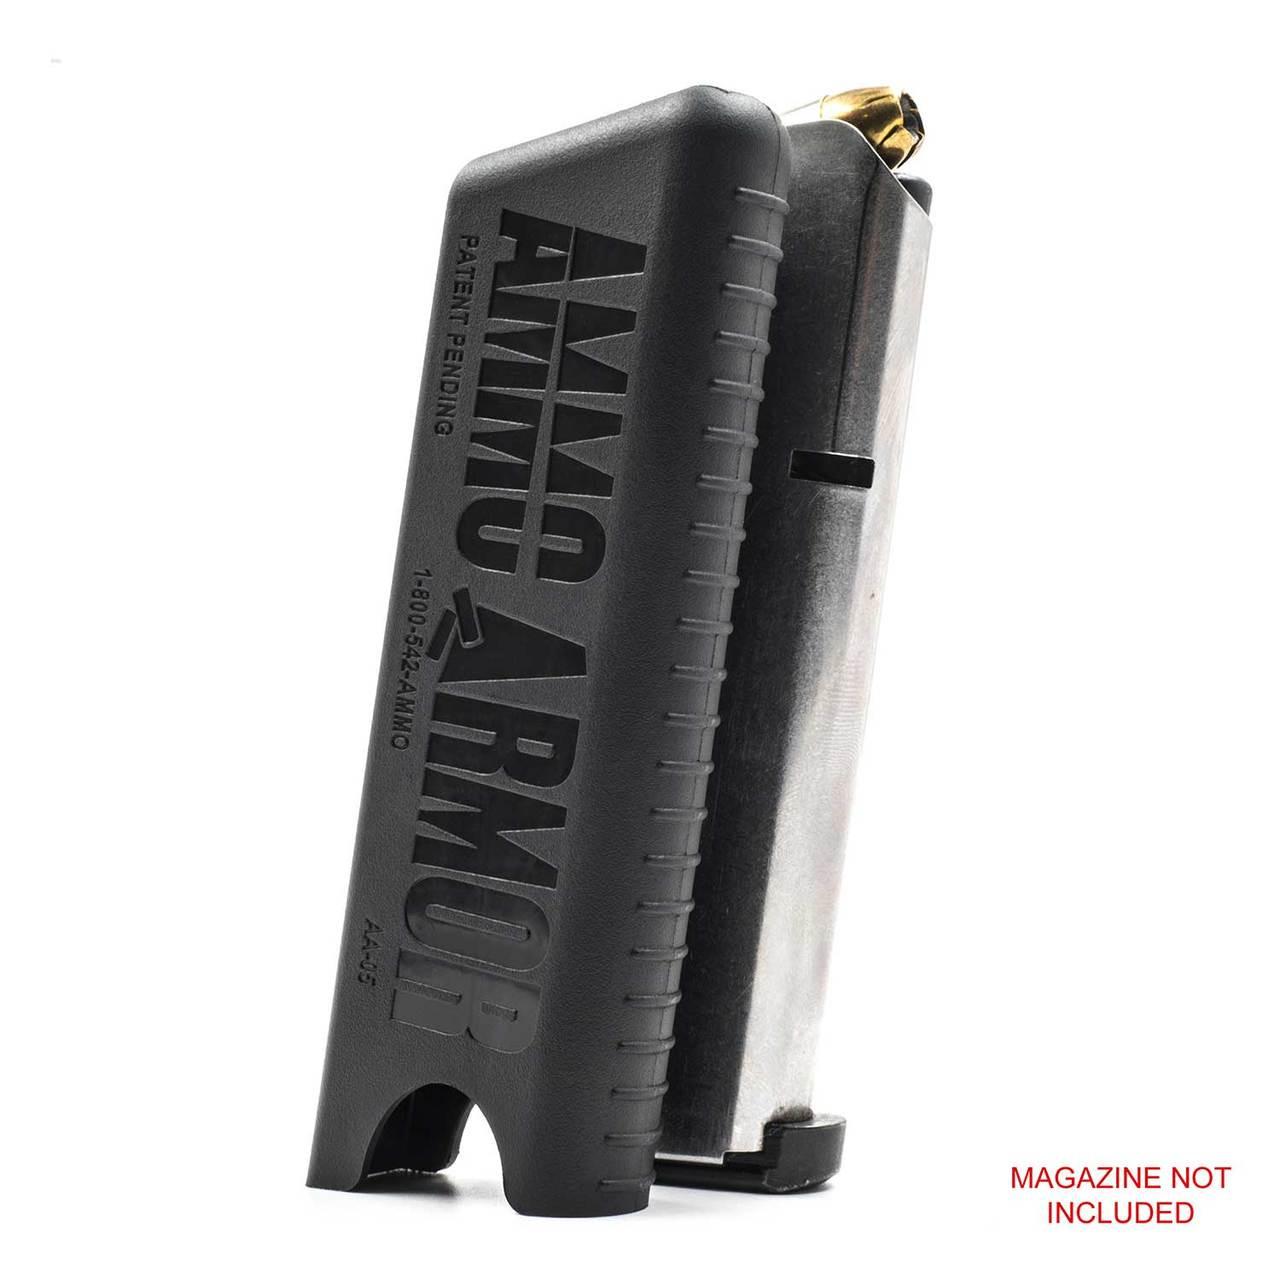 Kimber Super Carry Ultra (.45) Magazine Protector